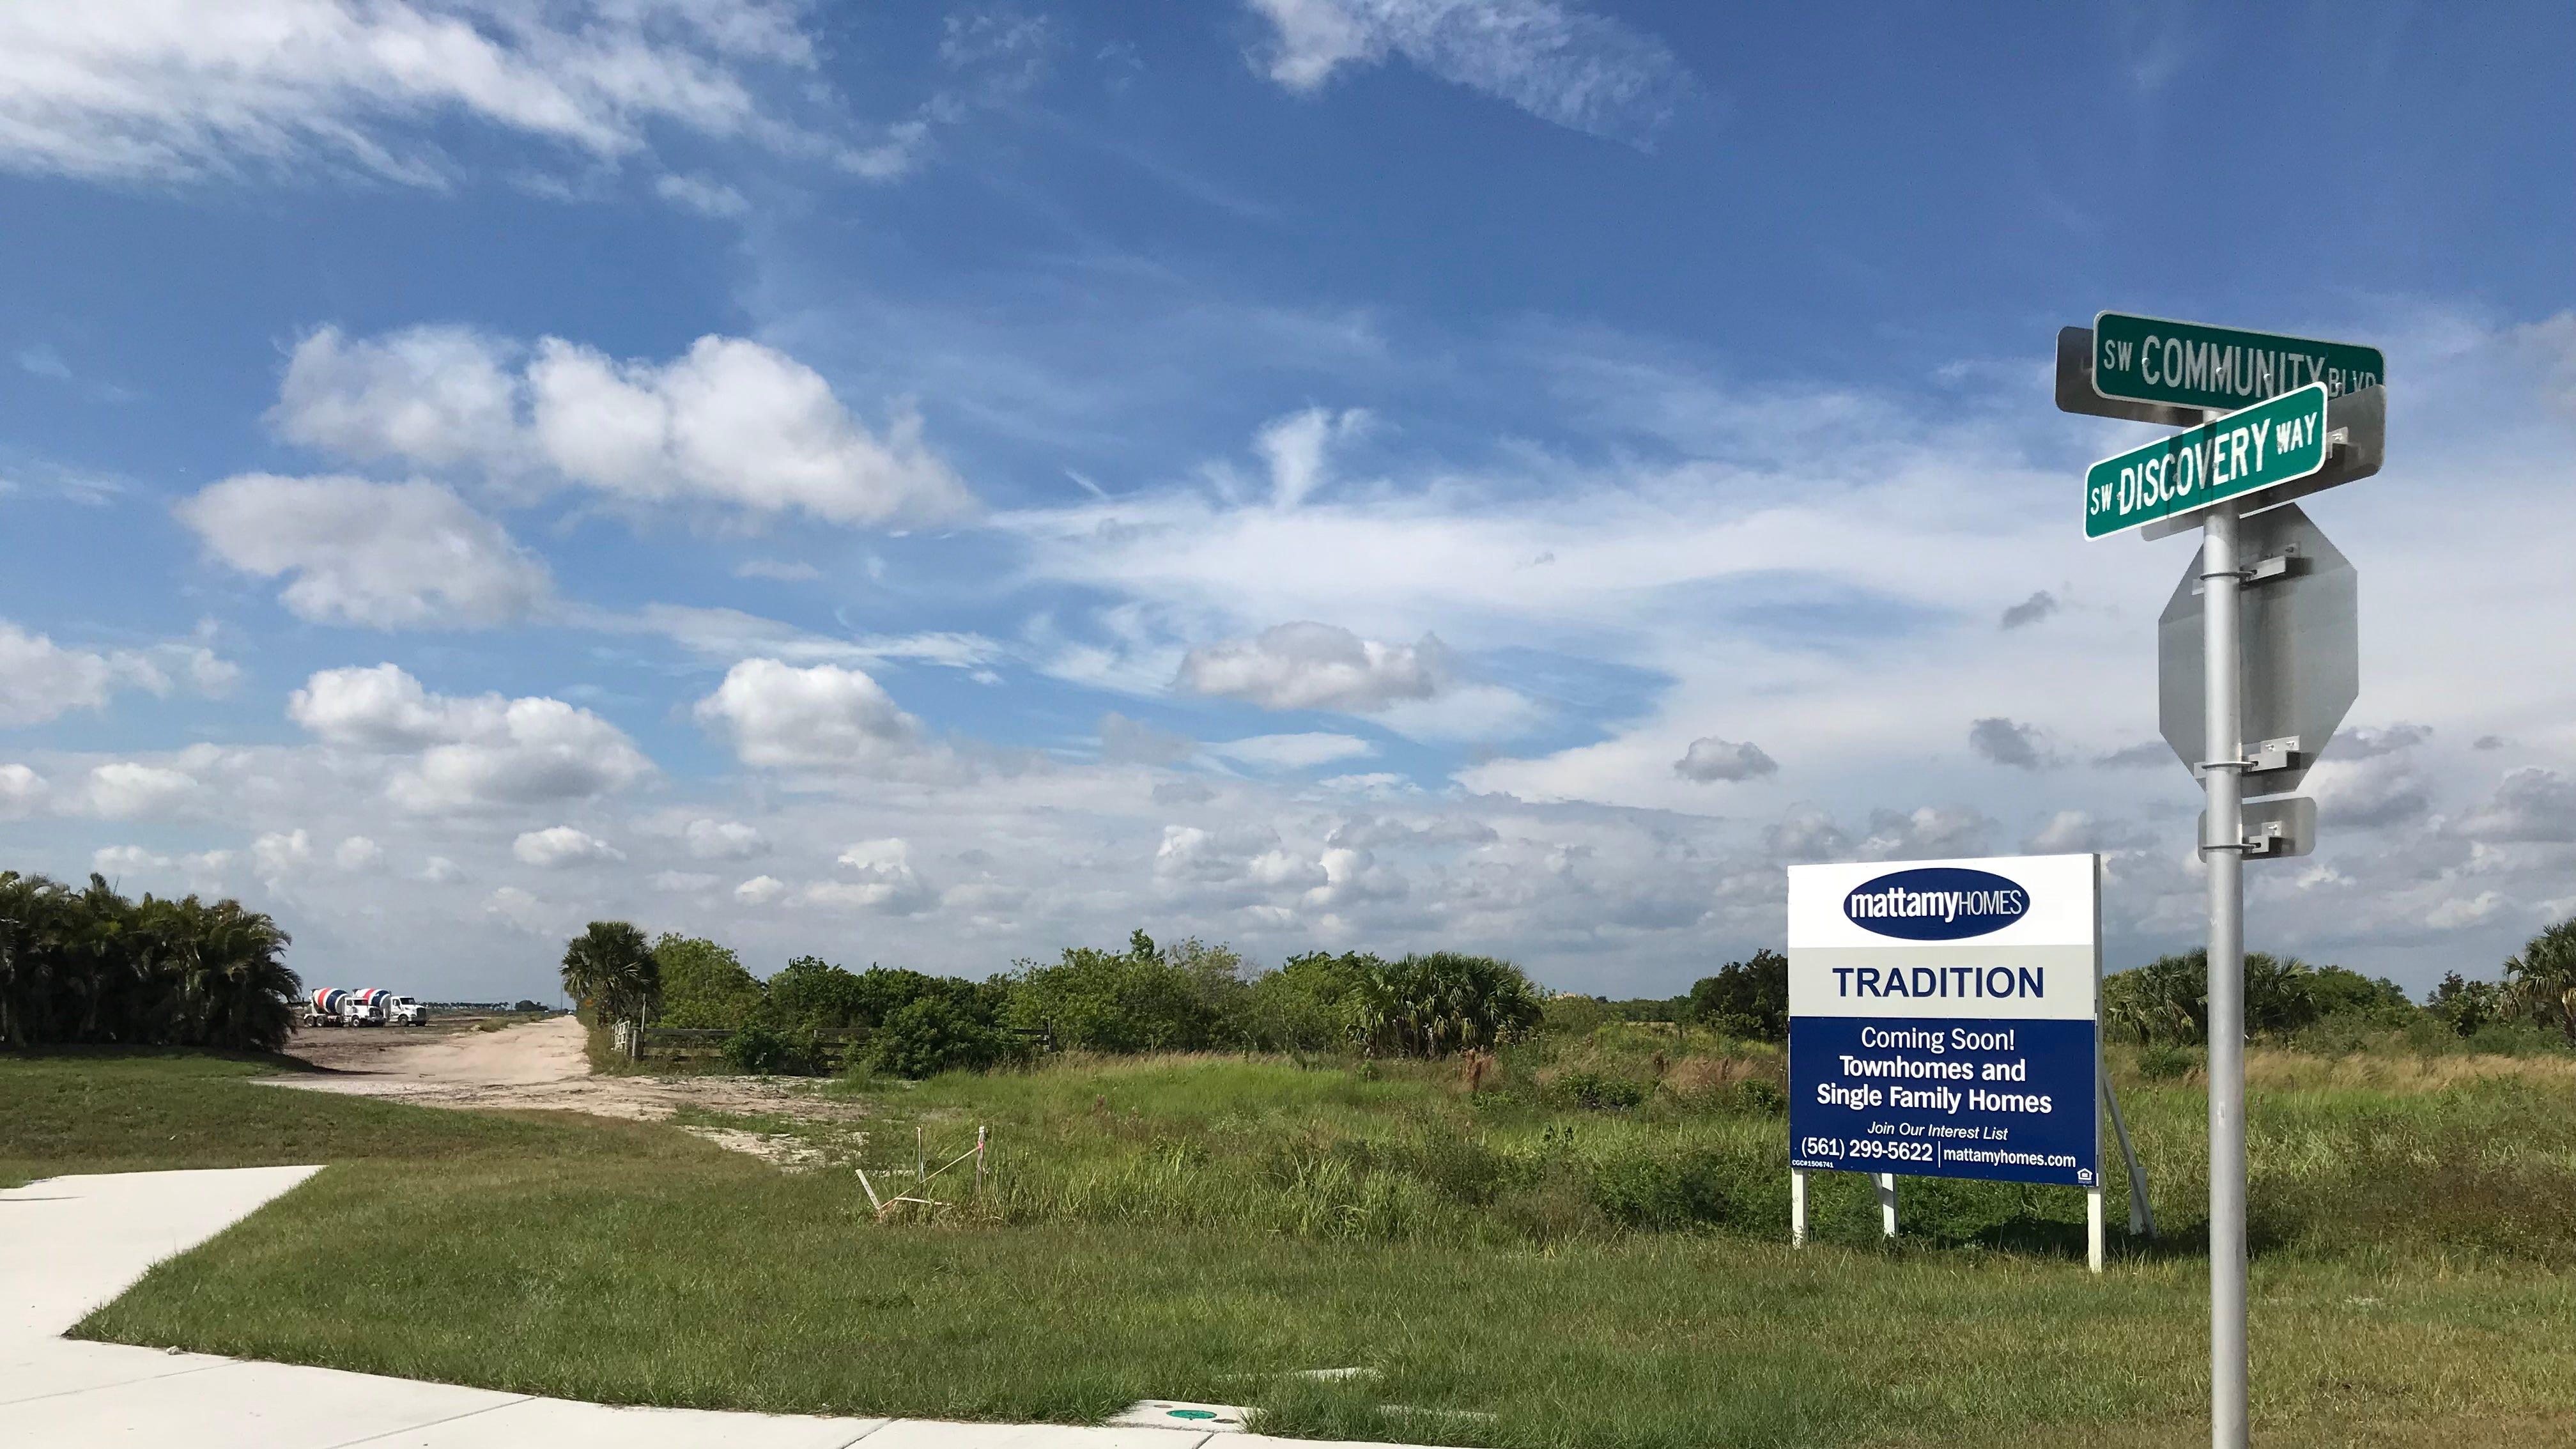 No road: Port St. Lucie blocks ans  Mattamy Homes scraps connection to Vitalia; Port St. Lucie City Council approves project